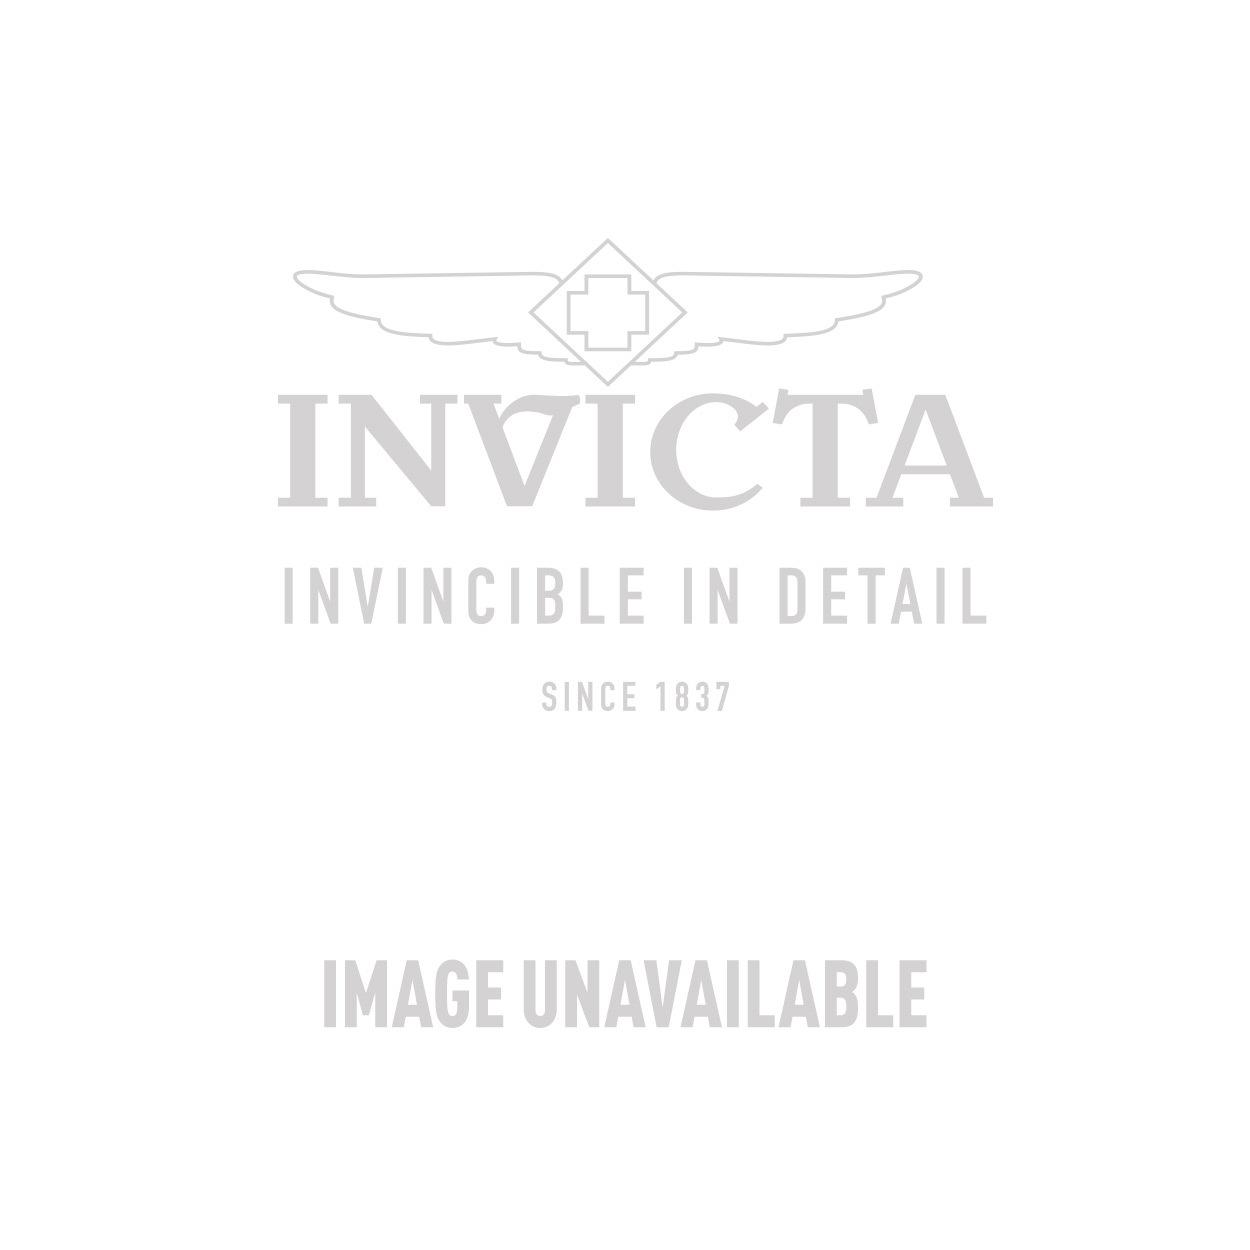 INVICTA Jewelry AISHA Earrings None 15.8 Silver 925 Rhodium+Yellow Gold - Model J0106